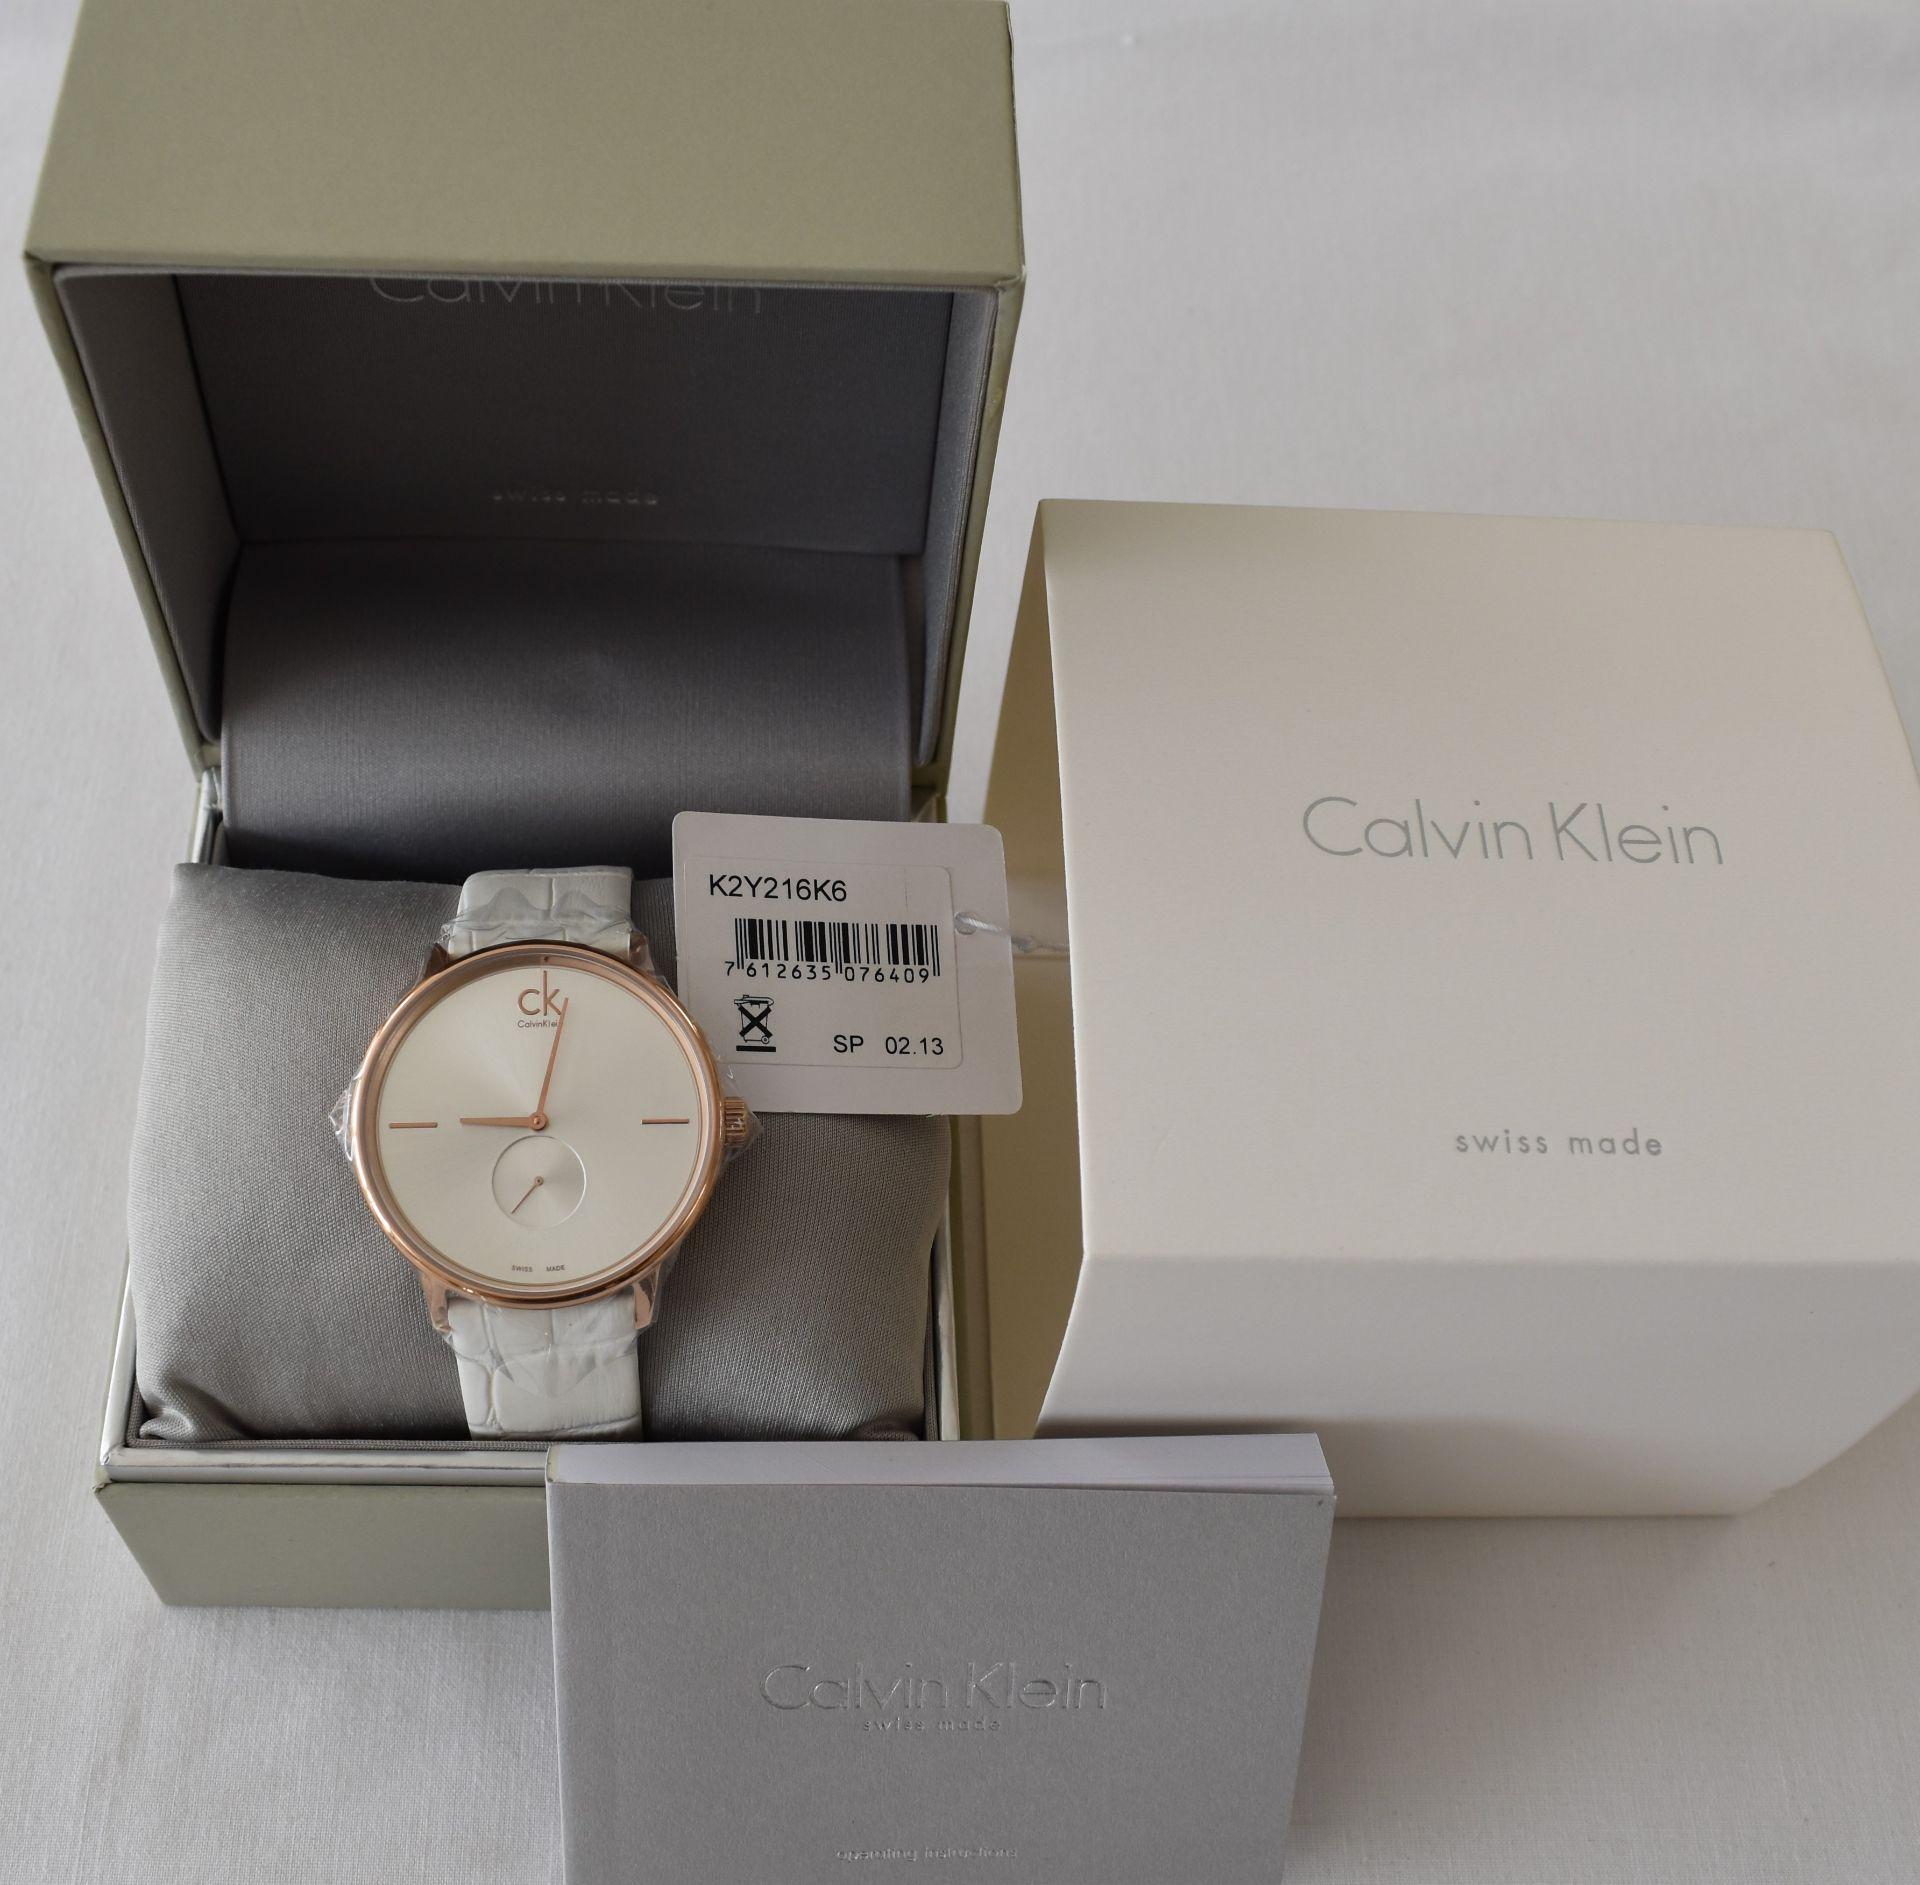 Calvin Klein K2Y216K6 Ladies Watch